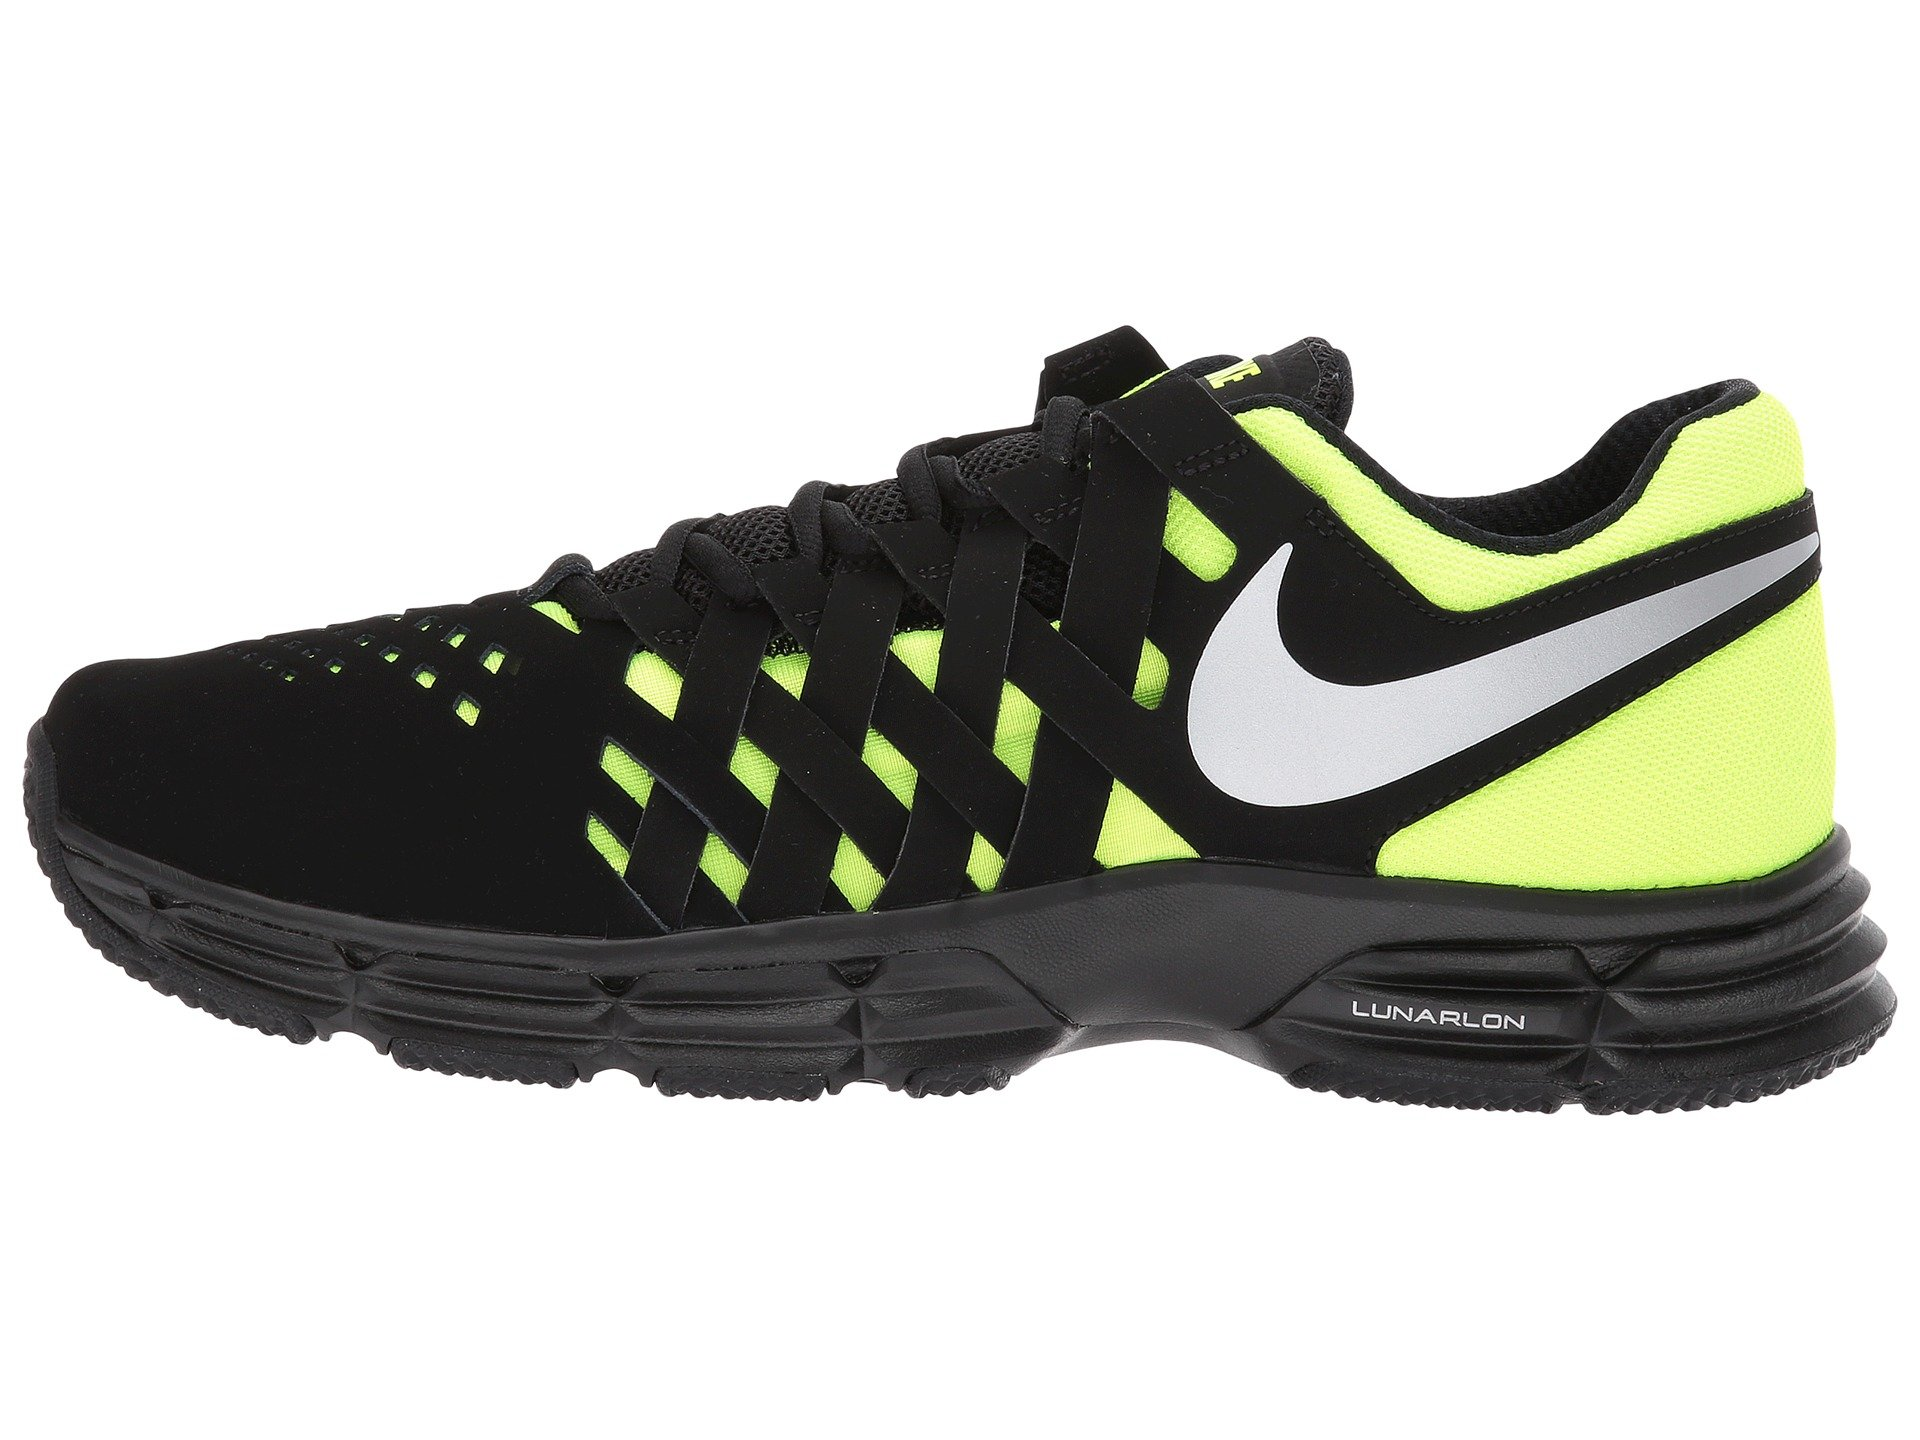 2f09fc317ee9a Men Nike Shoe Size 15 - GayNews